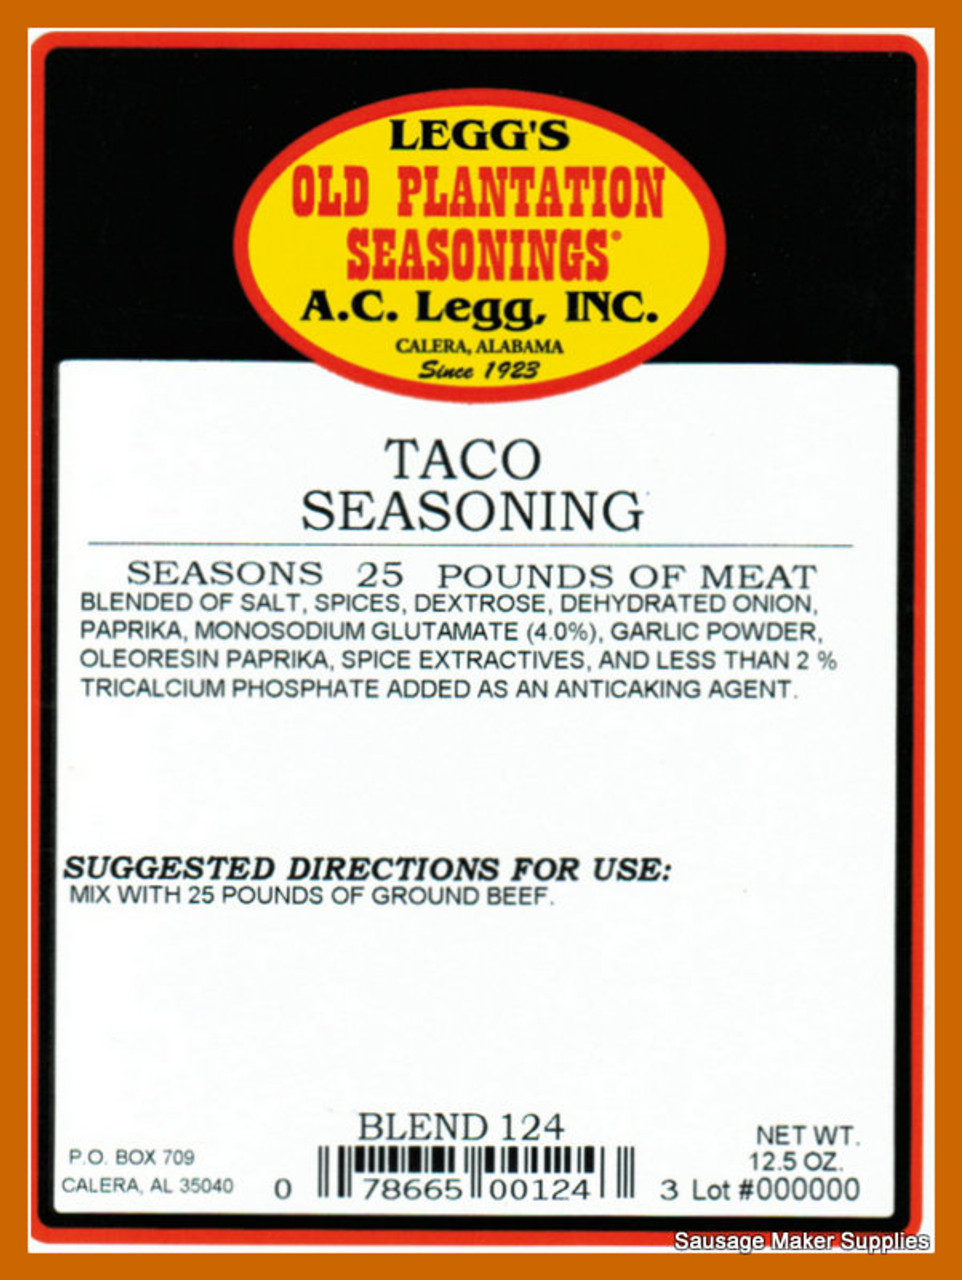 A.C. LEGGS OLD PLANTATION Taco Seasoning Blend 124